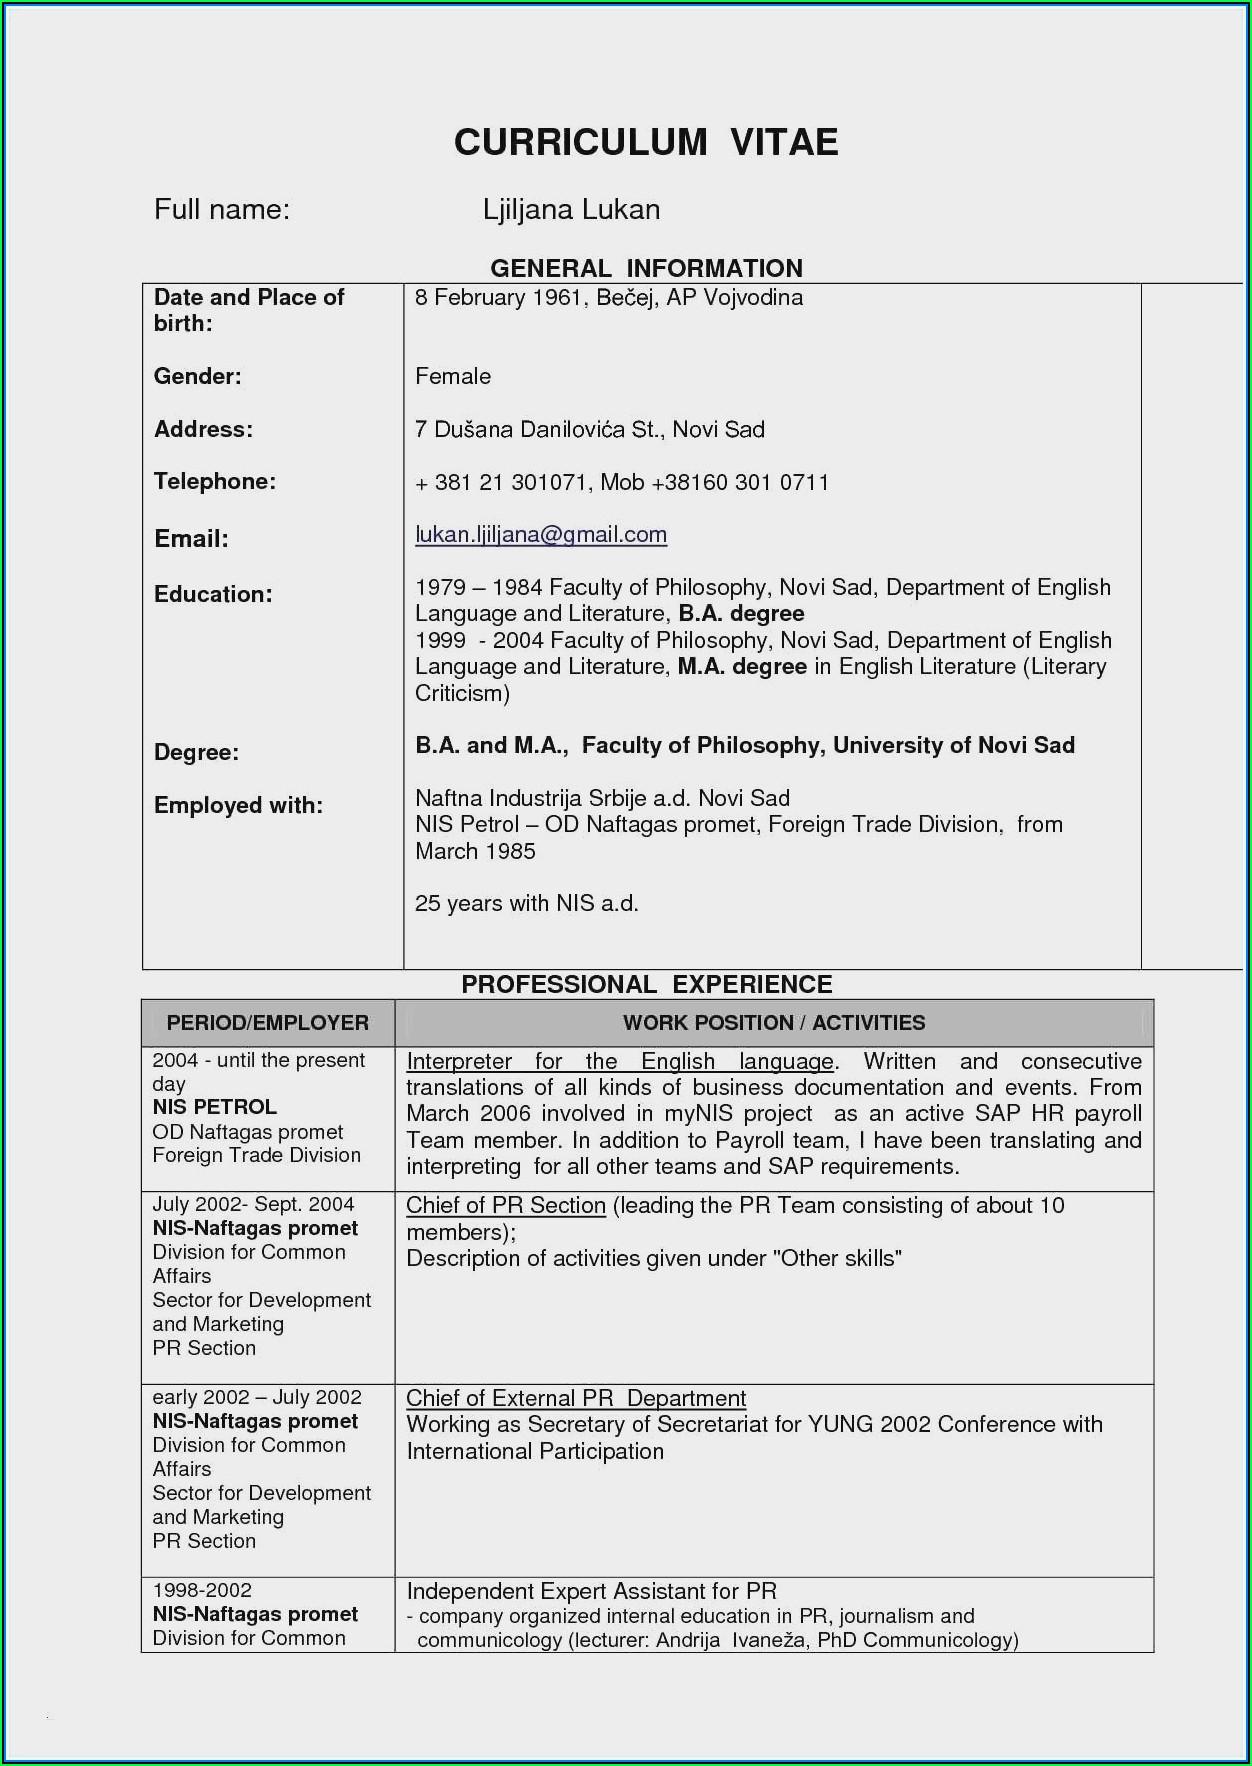 Civil Engineer Resume Format Free Download